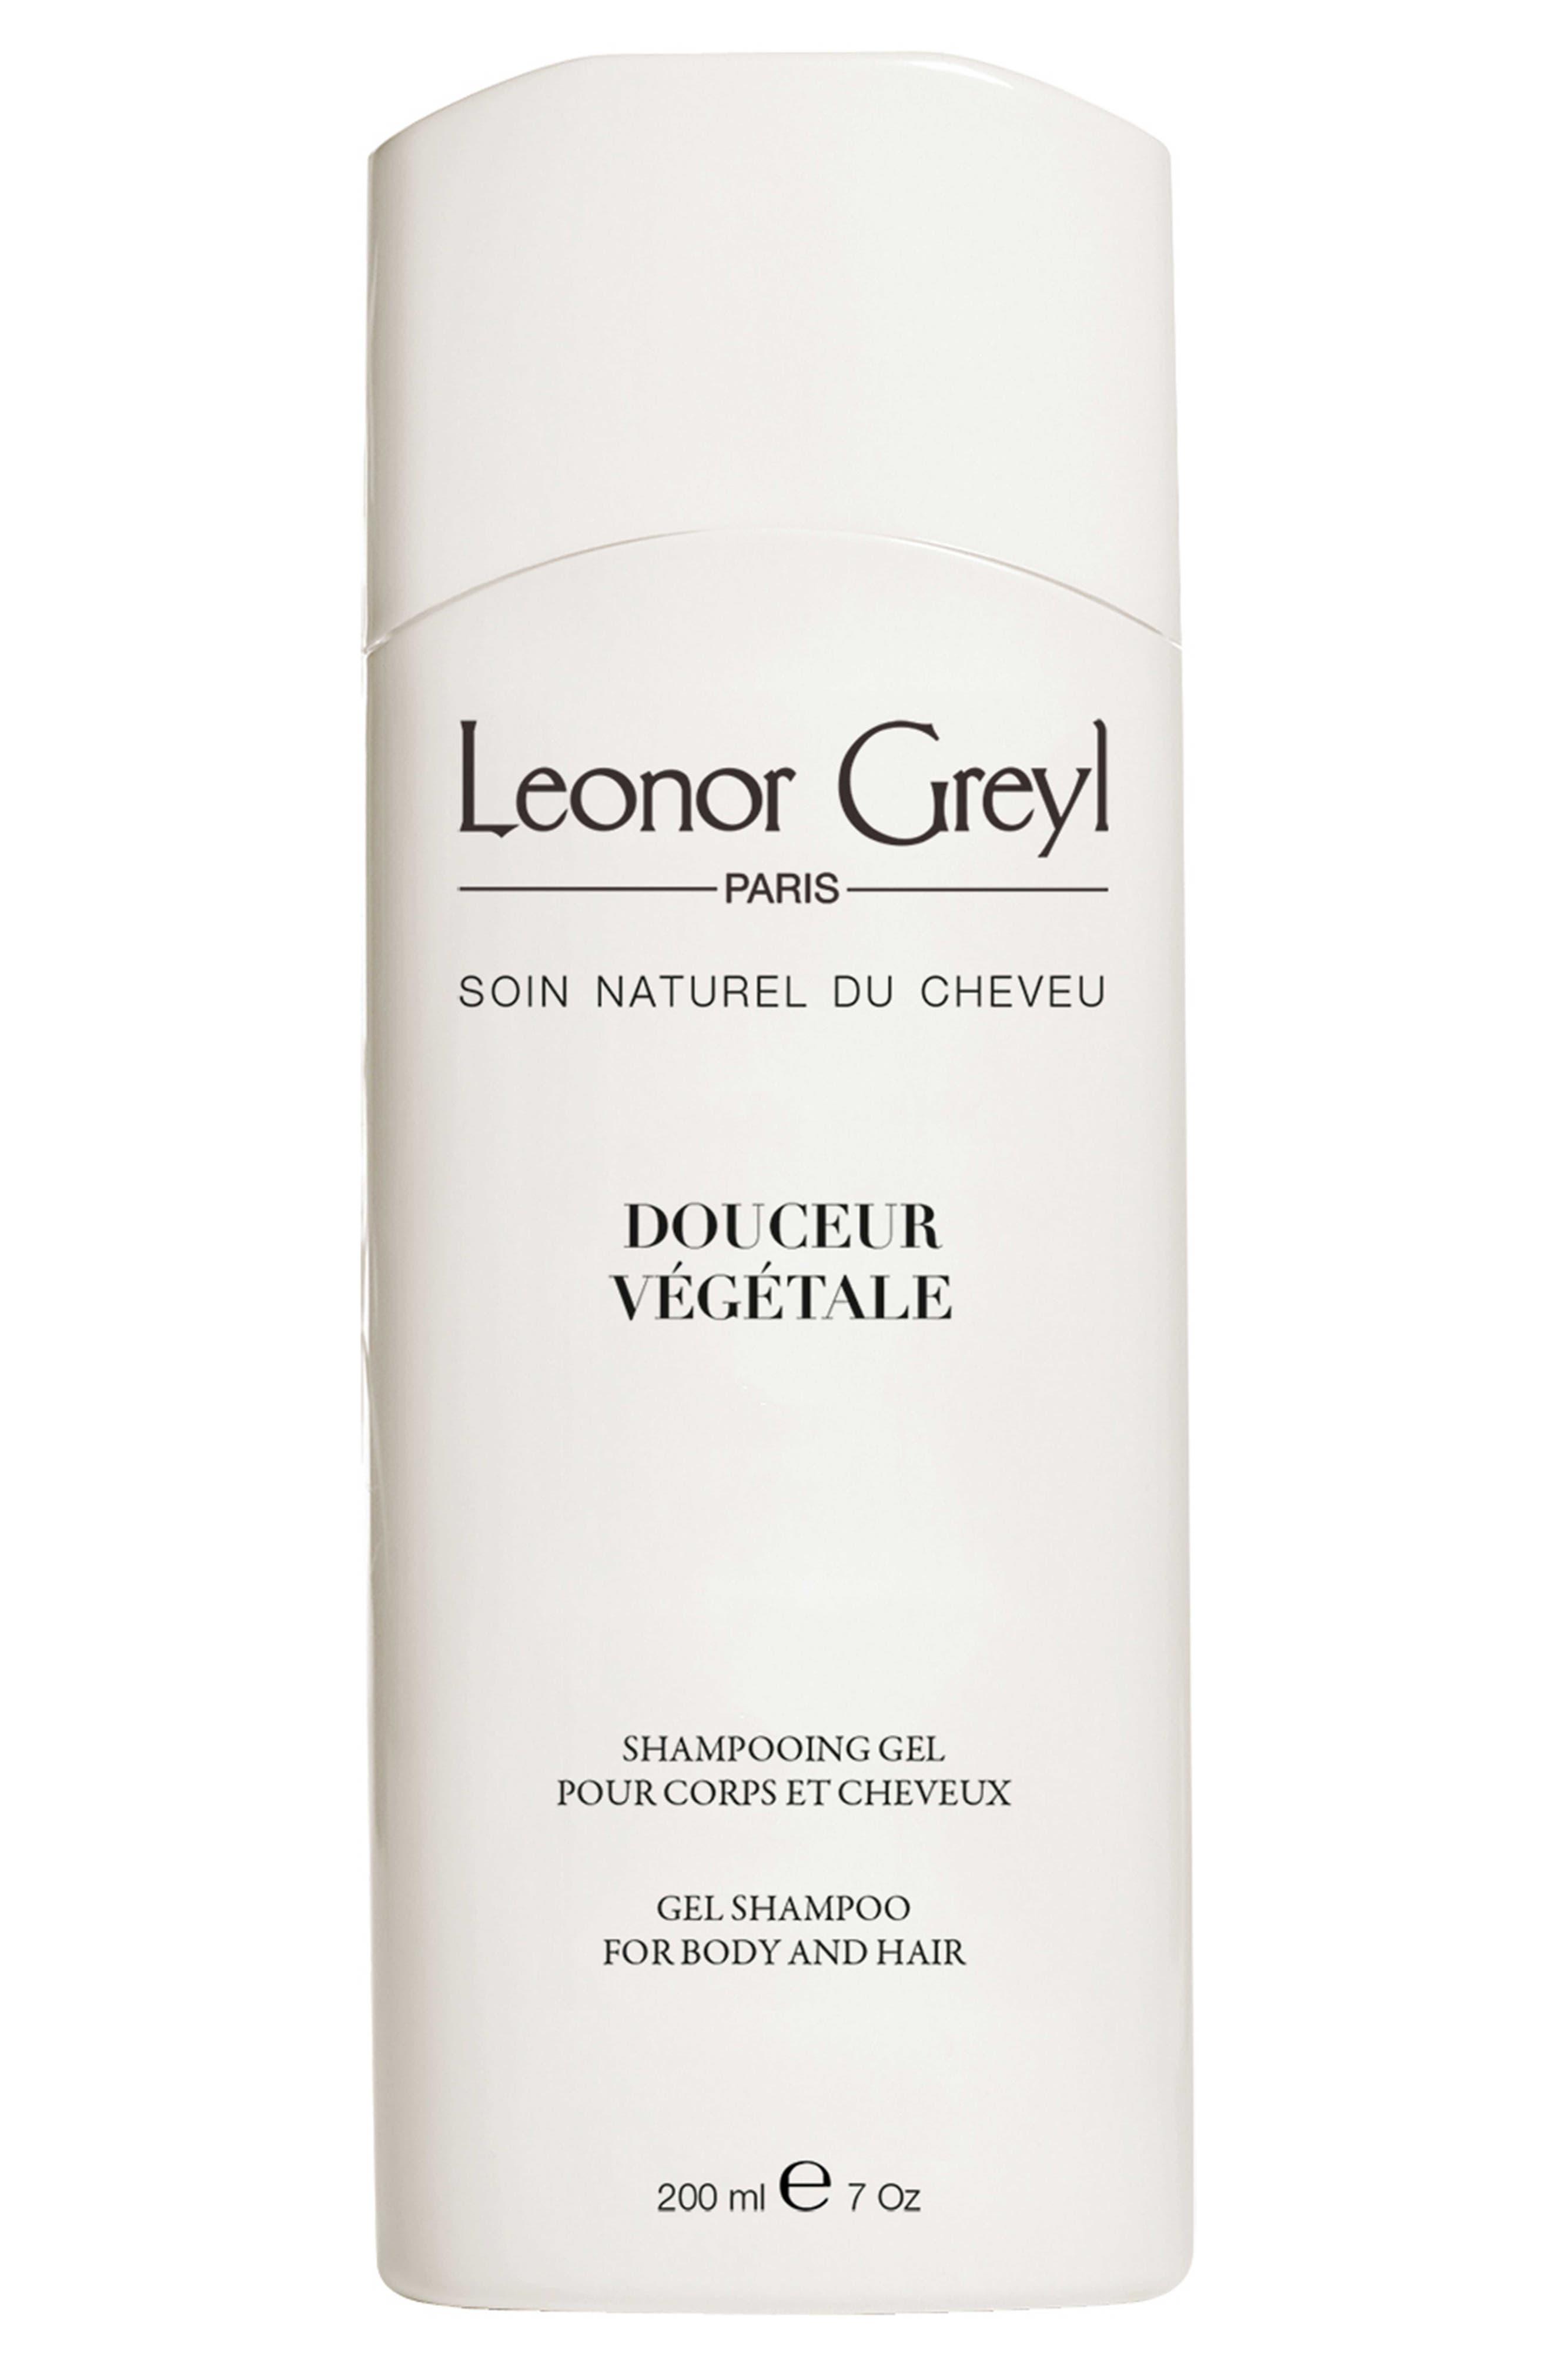 Alternate Image 1 Selected - Leonor Greyl PARIS 'Douceur Végétale' Gel Shampoo for Body & Hair